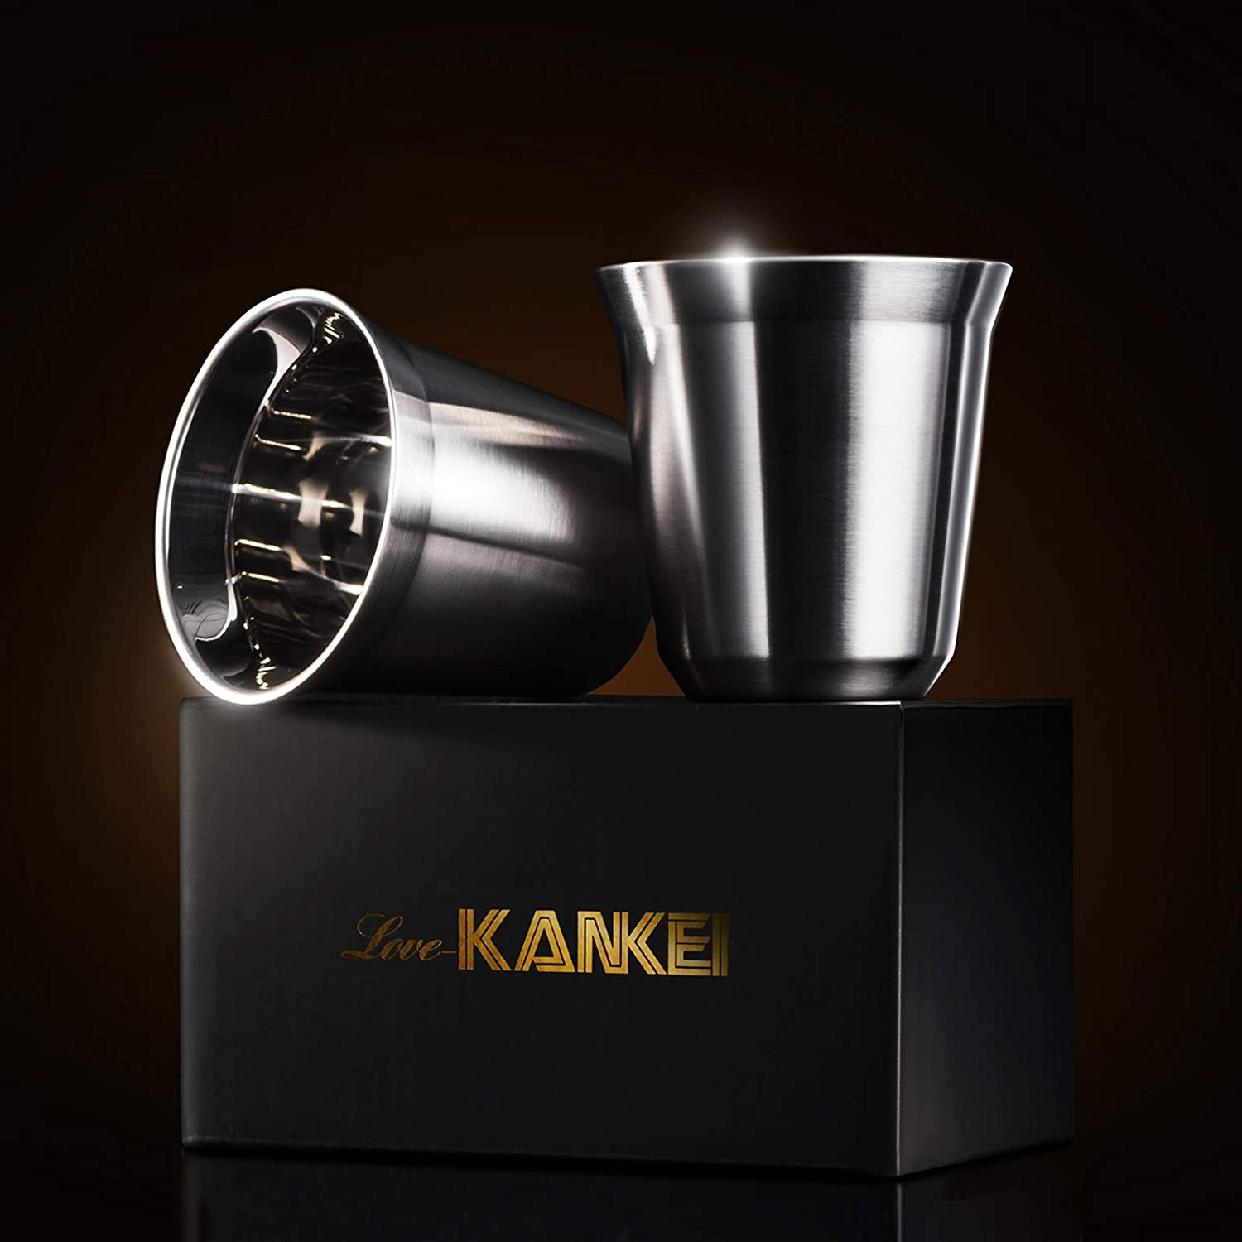 Love-KANKEI エスプレッソカップ ステンレス 2個セットの商品画像7